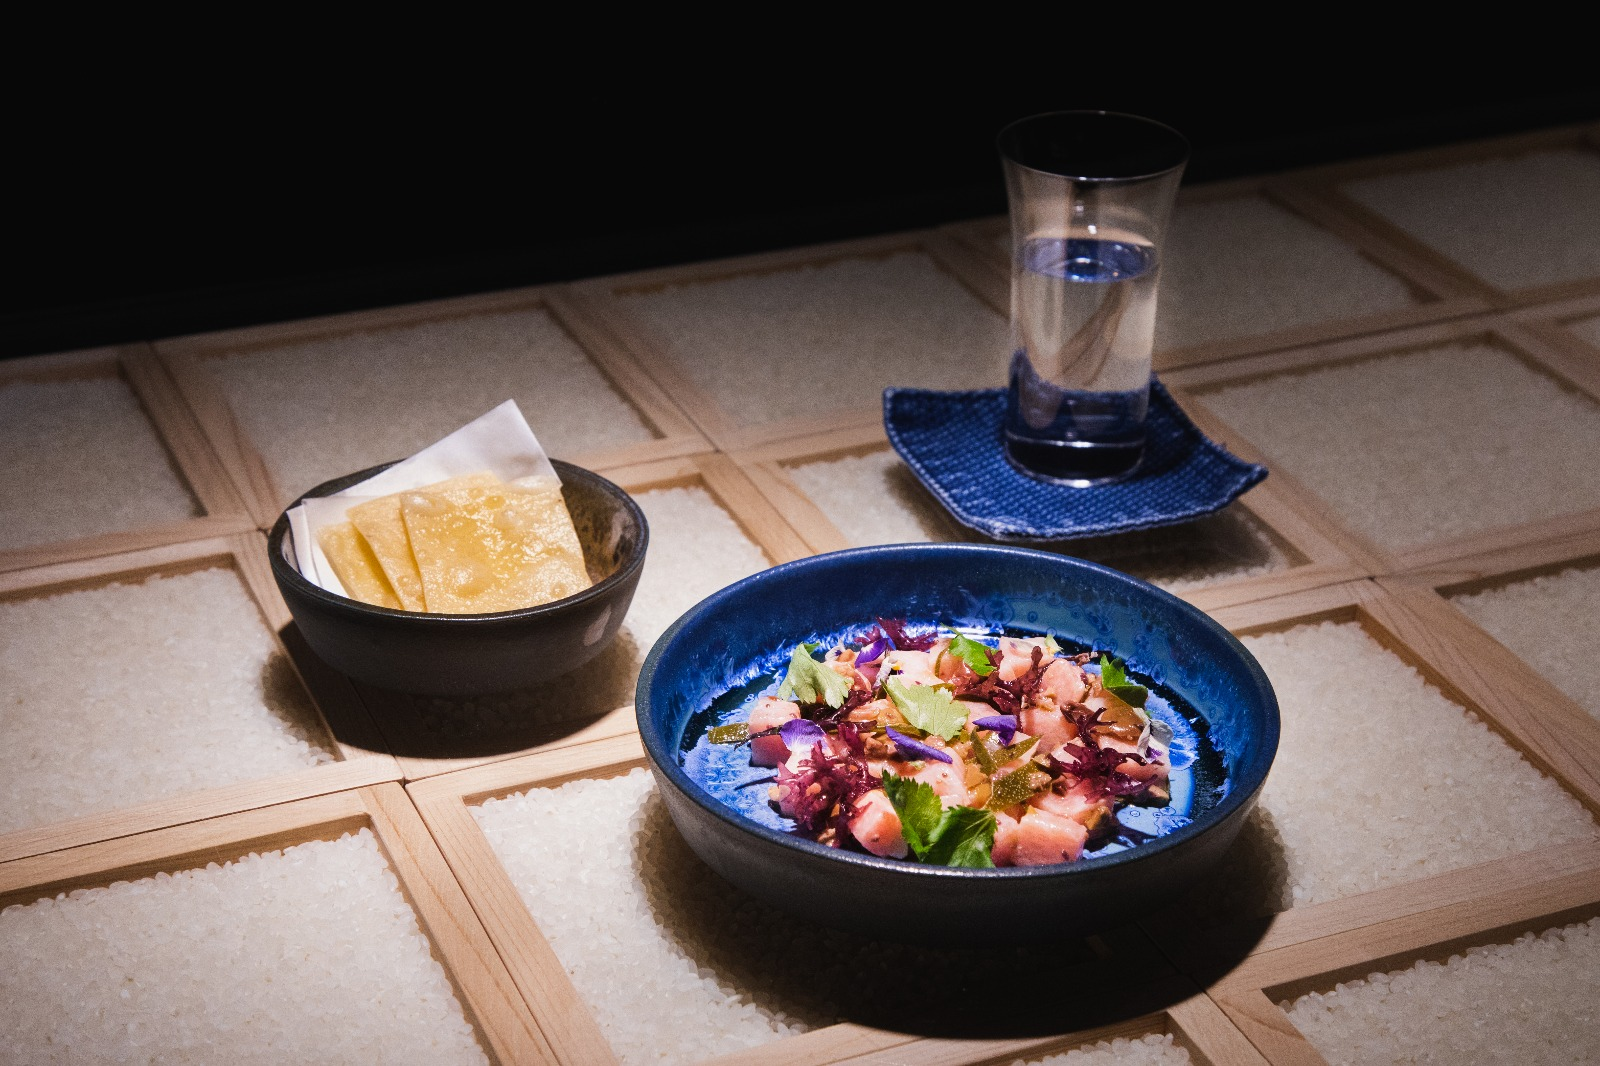 Custom ceramic plates fro chefs